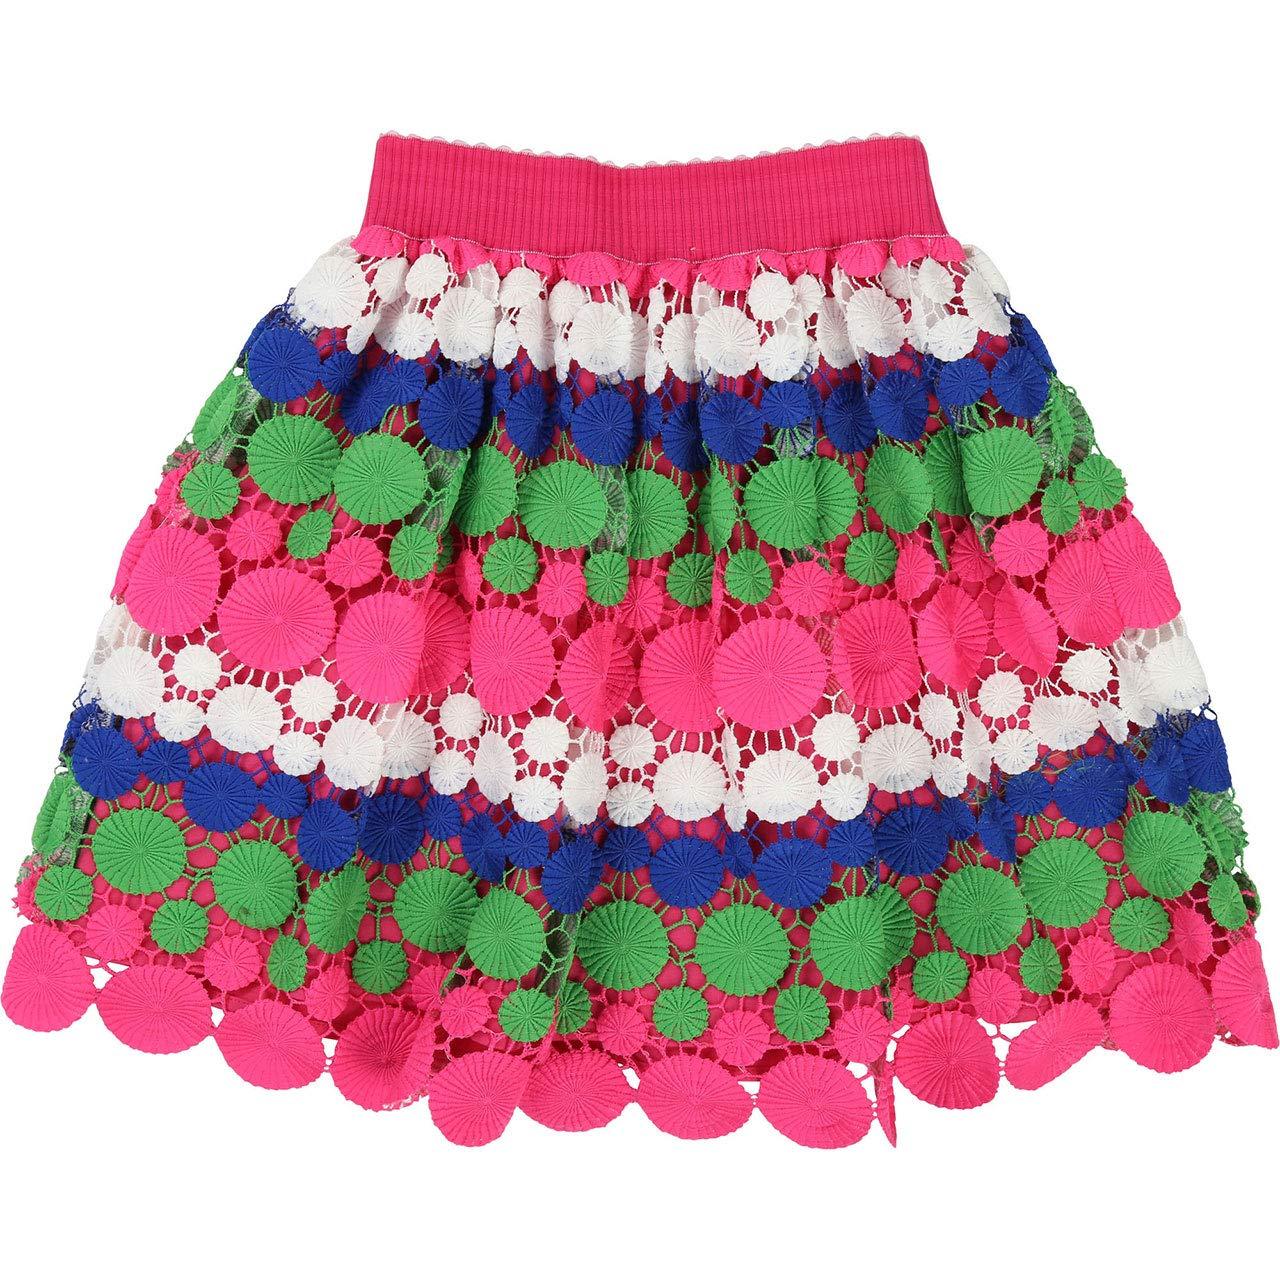 Billieblush - Toddler Girl's Multi Lace Skirt - Pink - Size 5